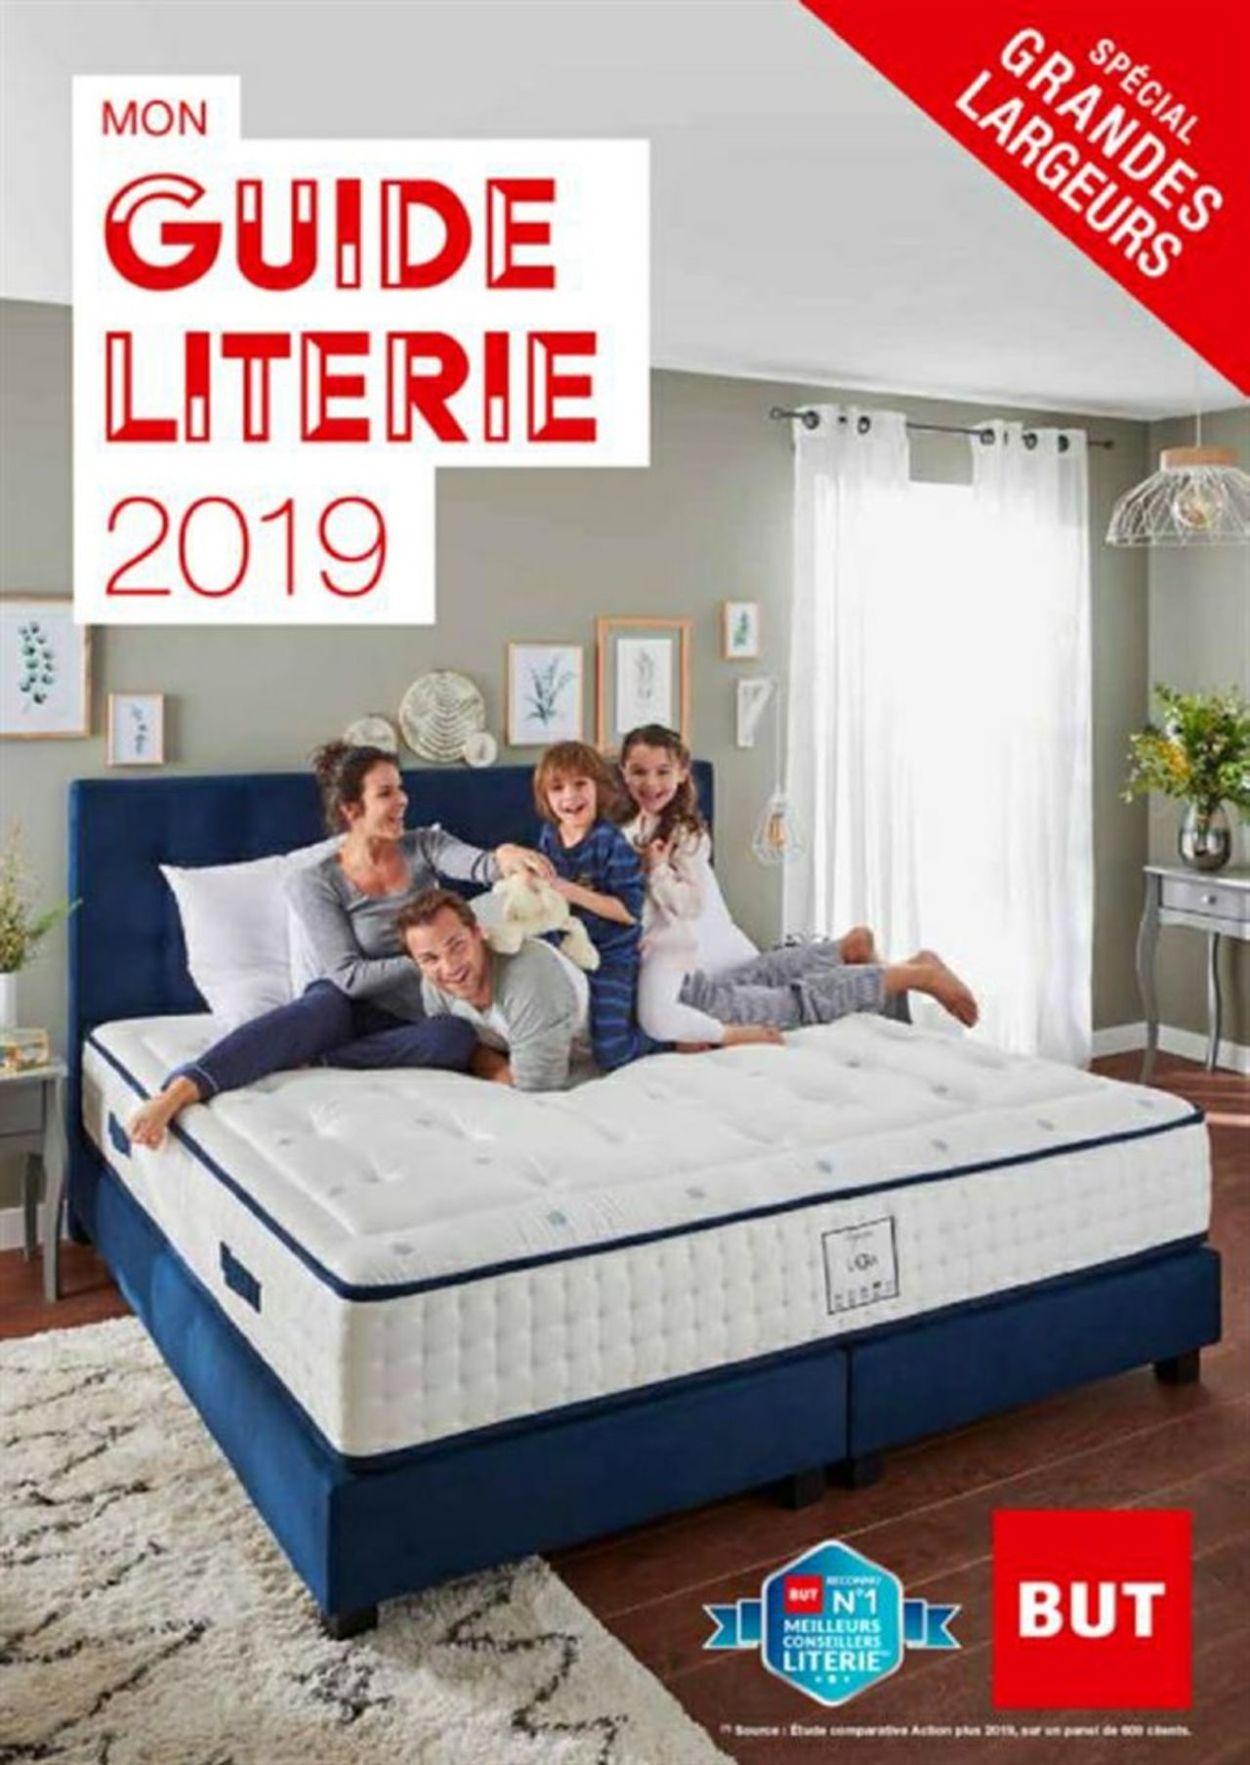 But Catalogue - 11.06-07.10.2019